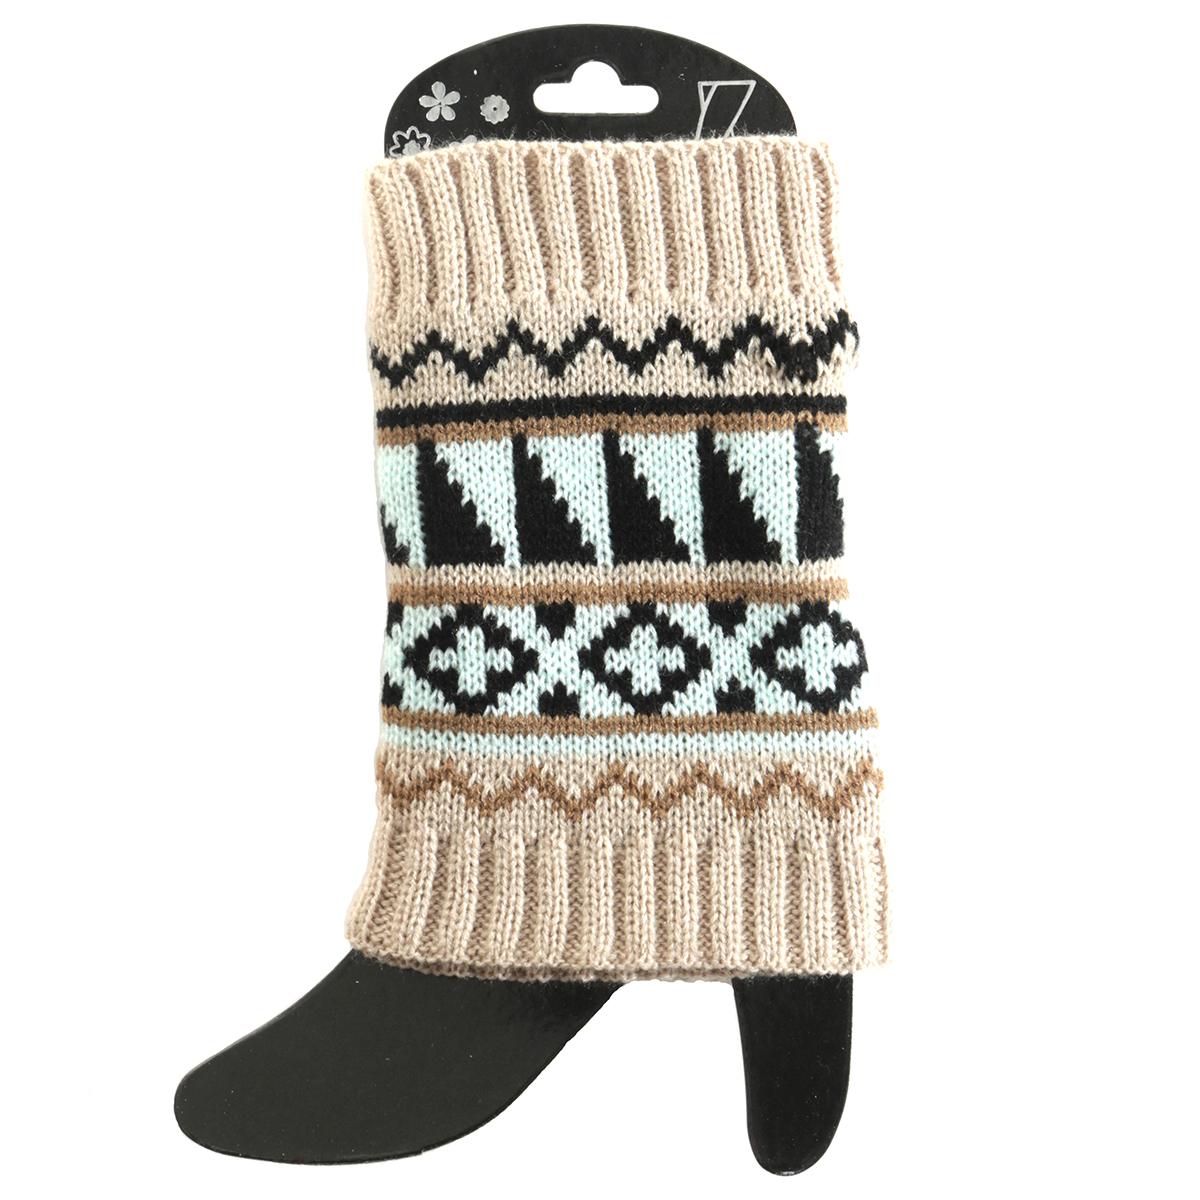 Tan/Ming Sweater Boot Cuff Short